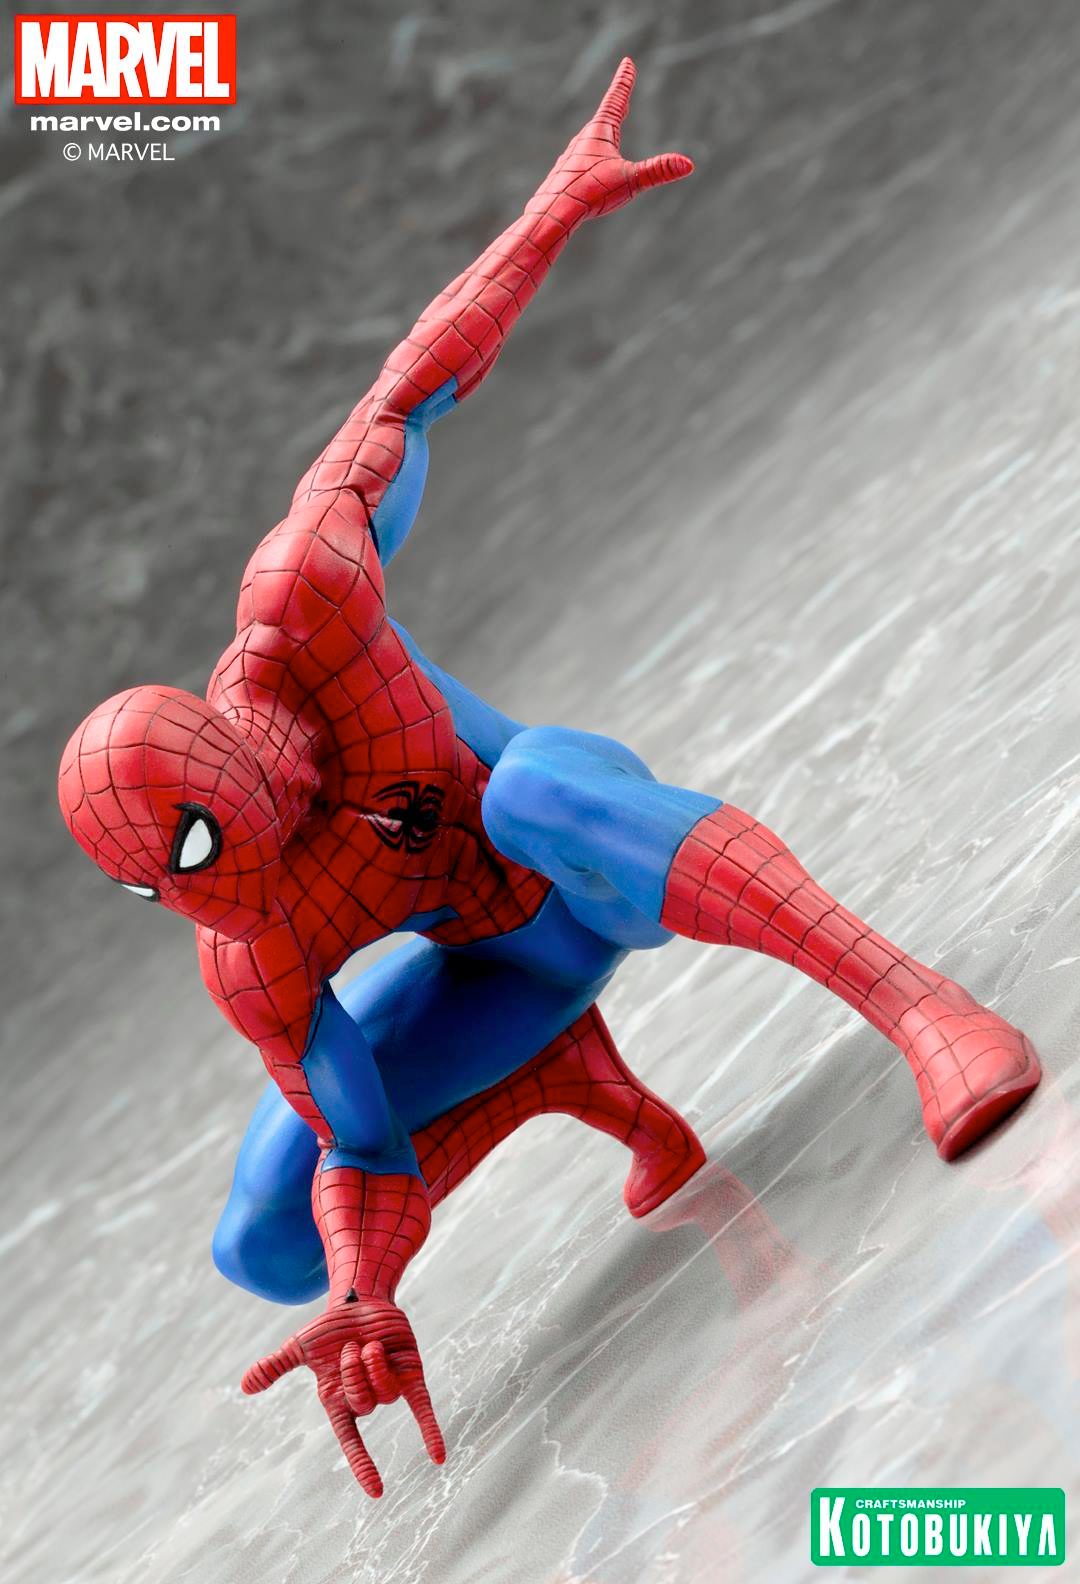 superhero bits  superman vr roller coaster  stan lee u0026 39 s favorite marvel movie  u0026 more  u2013 page 3 of